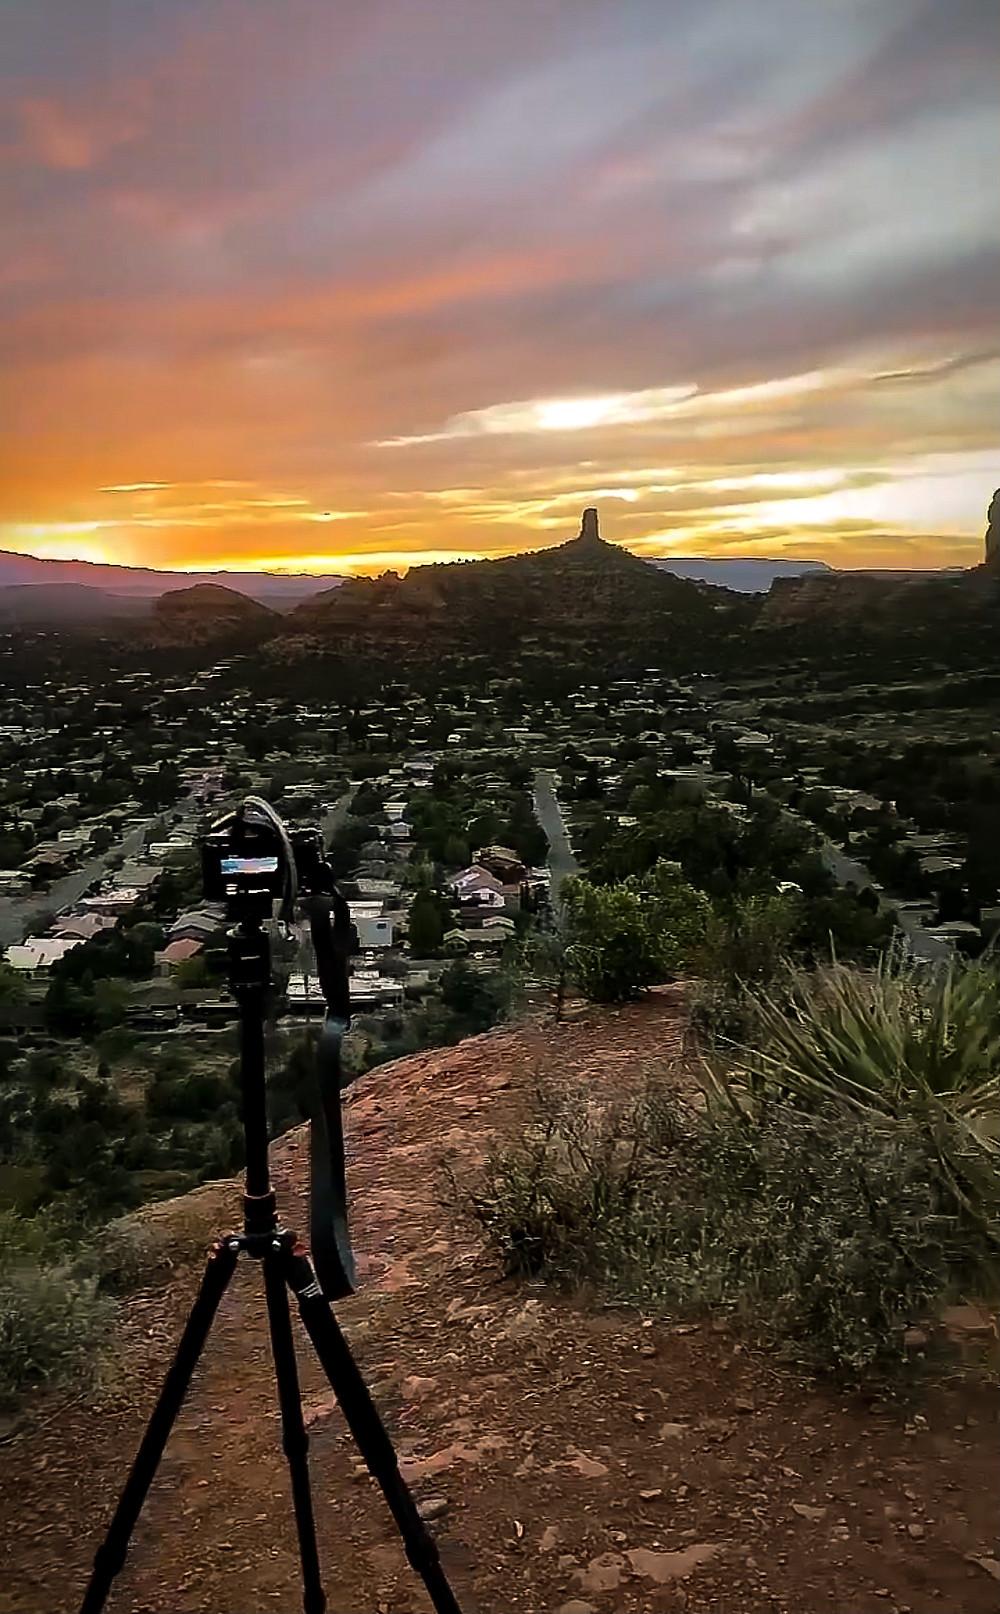 a camera on a tripod, set up to film a brilliant sunset over Devil's Bridge in Sedona Arizona